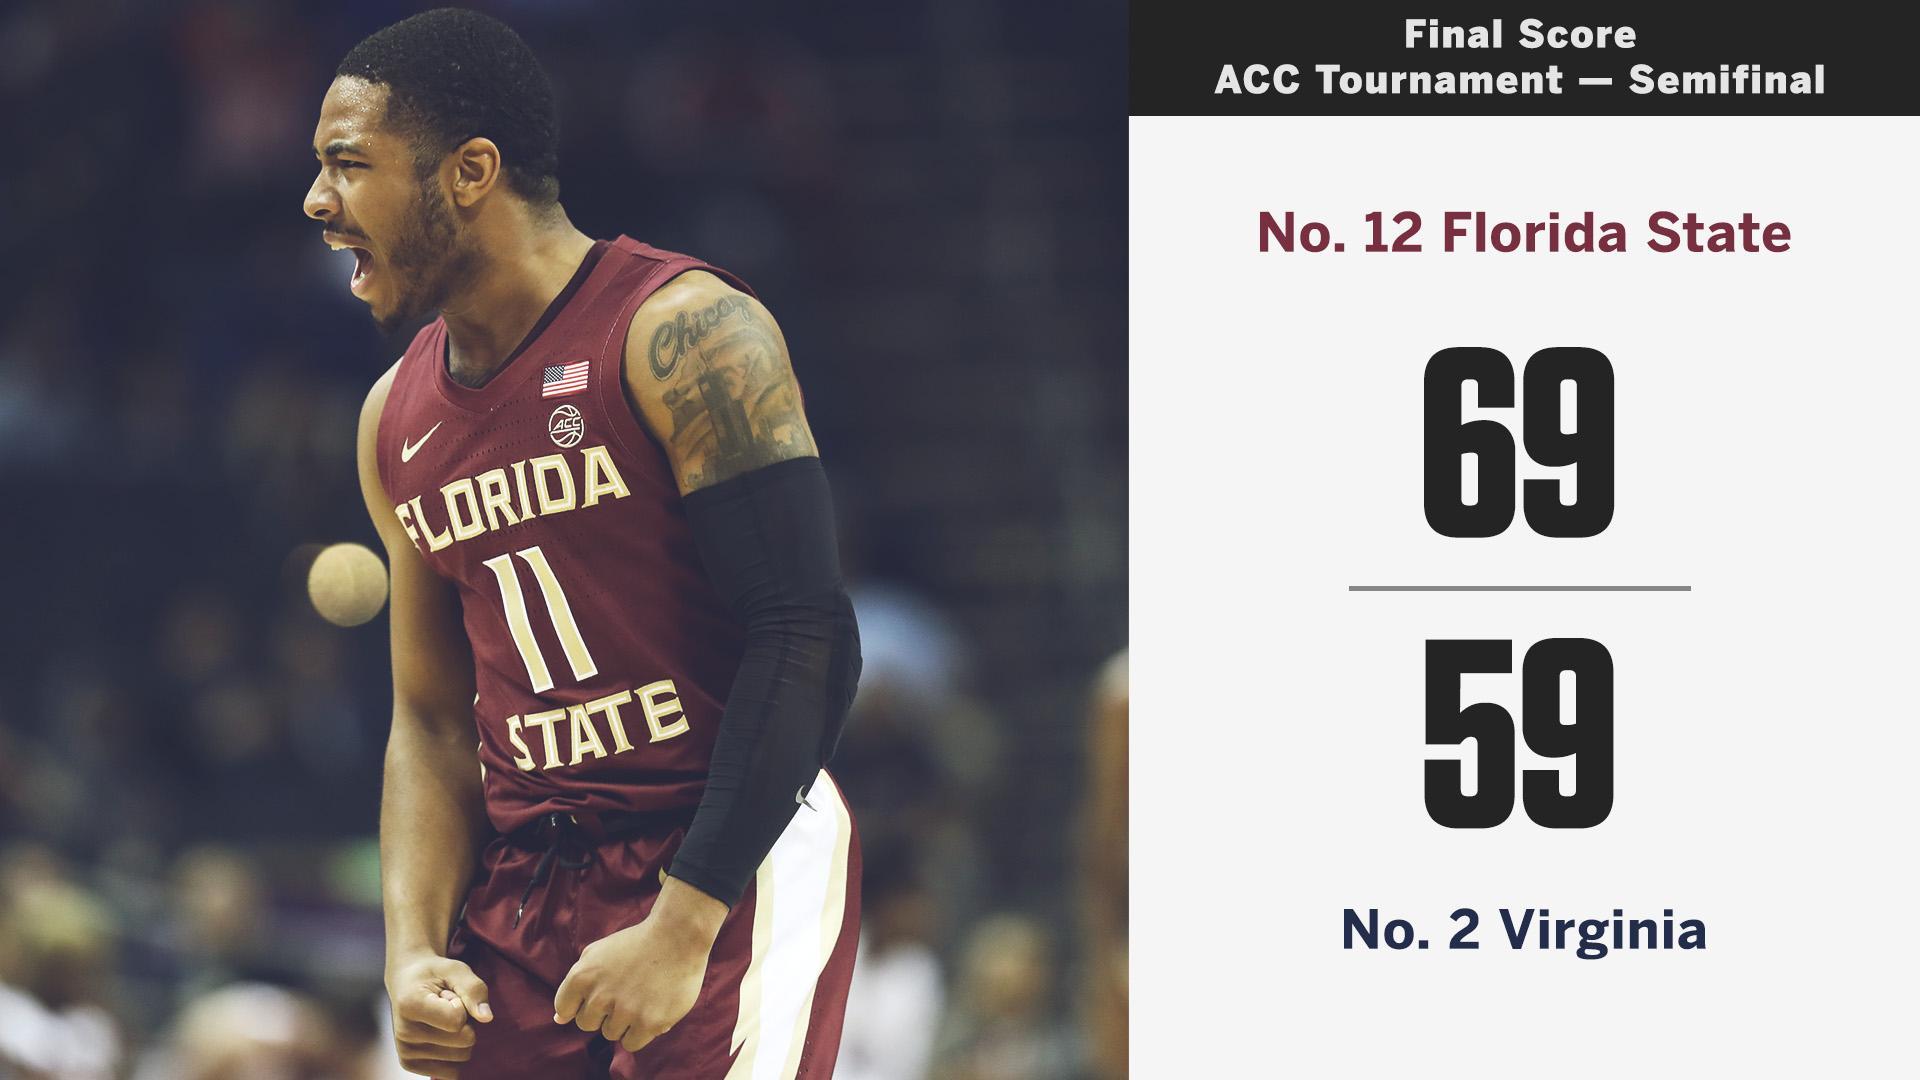 �� ACC TOURNAMENT UPSET ��  No. 12 Florida State beats No. 2 Virginia to advance to the Final! https://t.co/sjPi0v5CQr